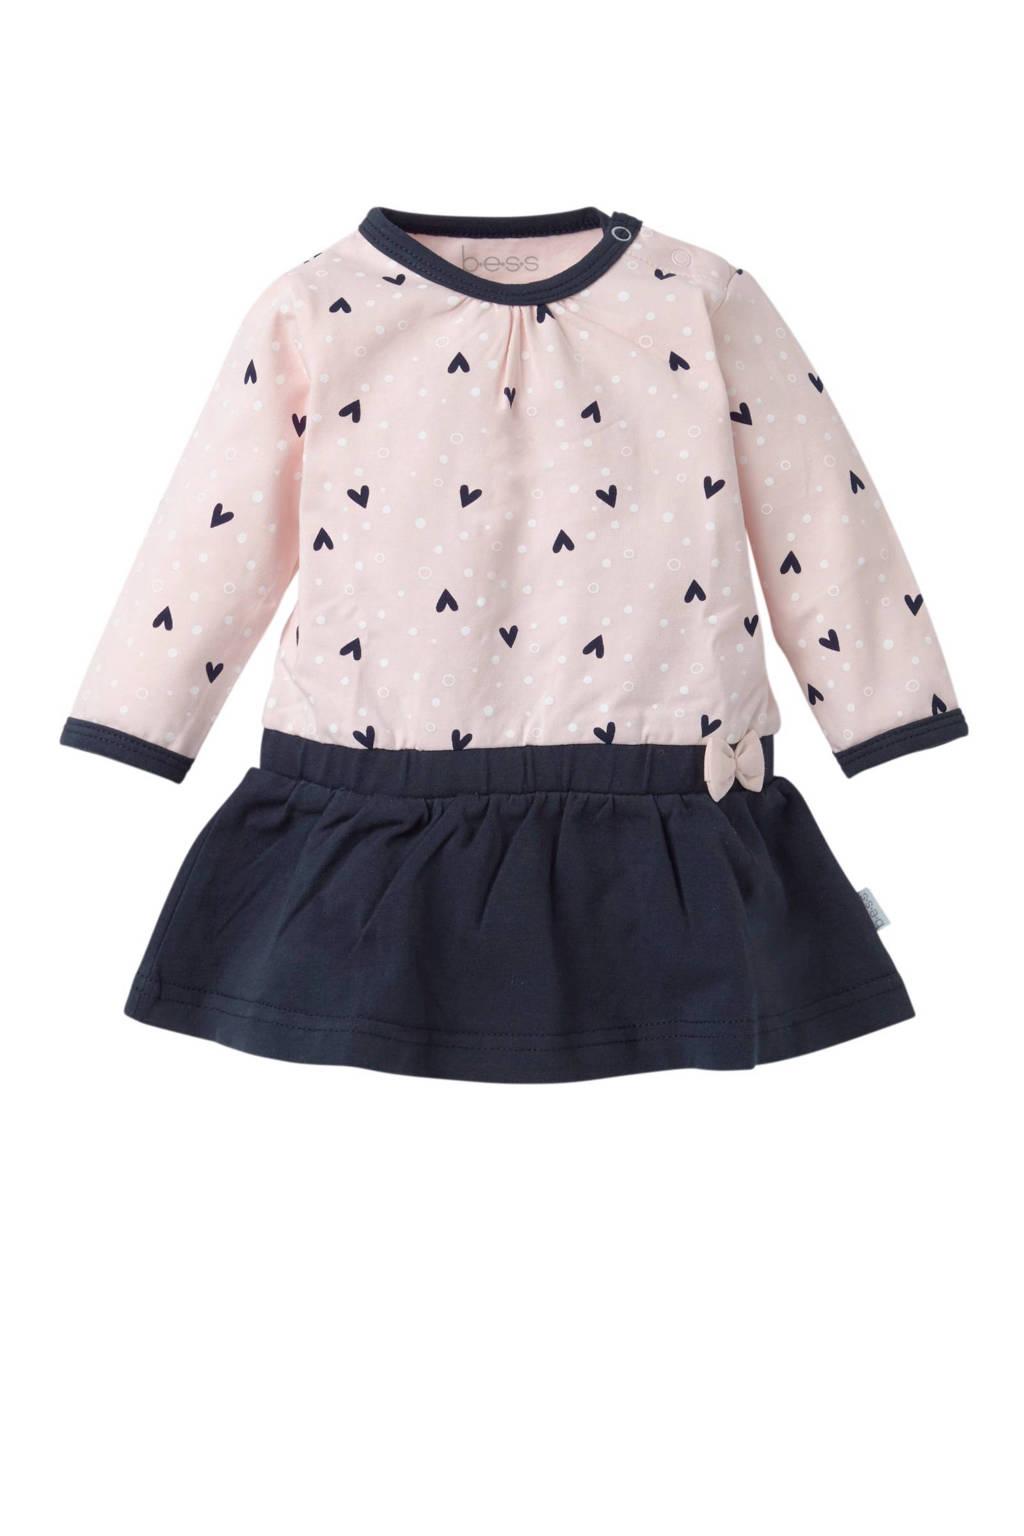 B.E.S.S baby newborn jurk Hearts met hartjes, Lichtroze/marine